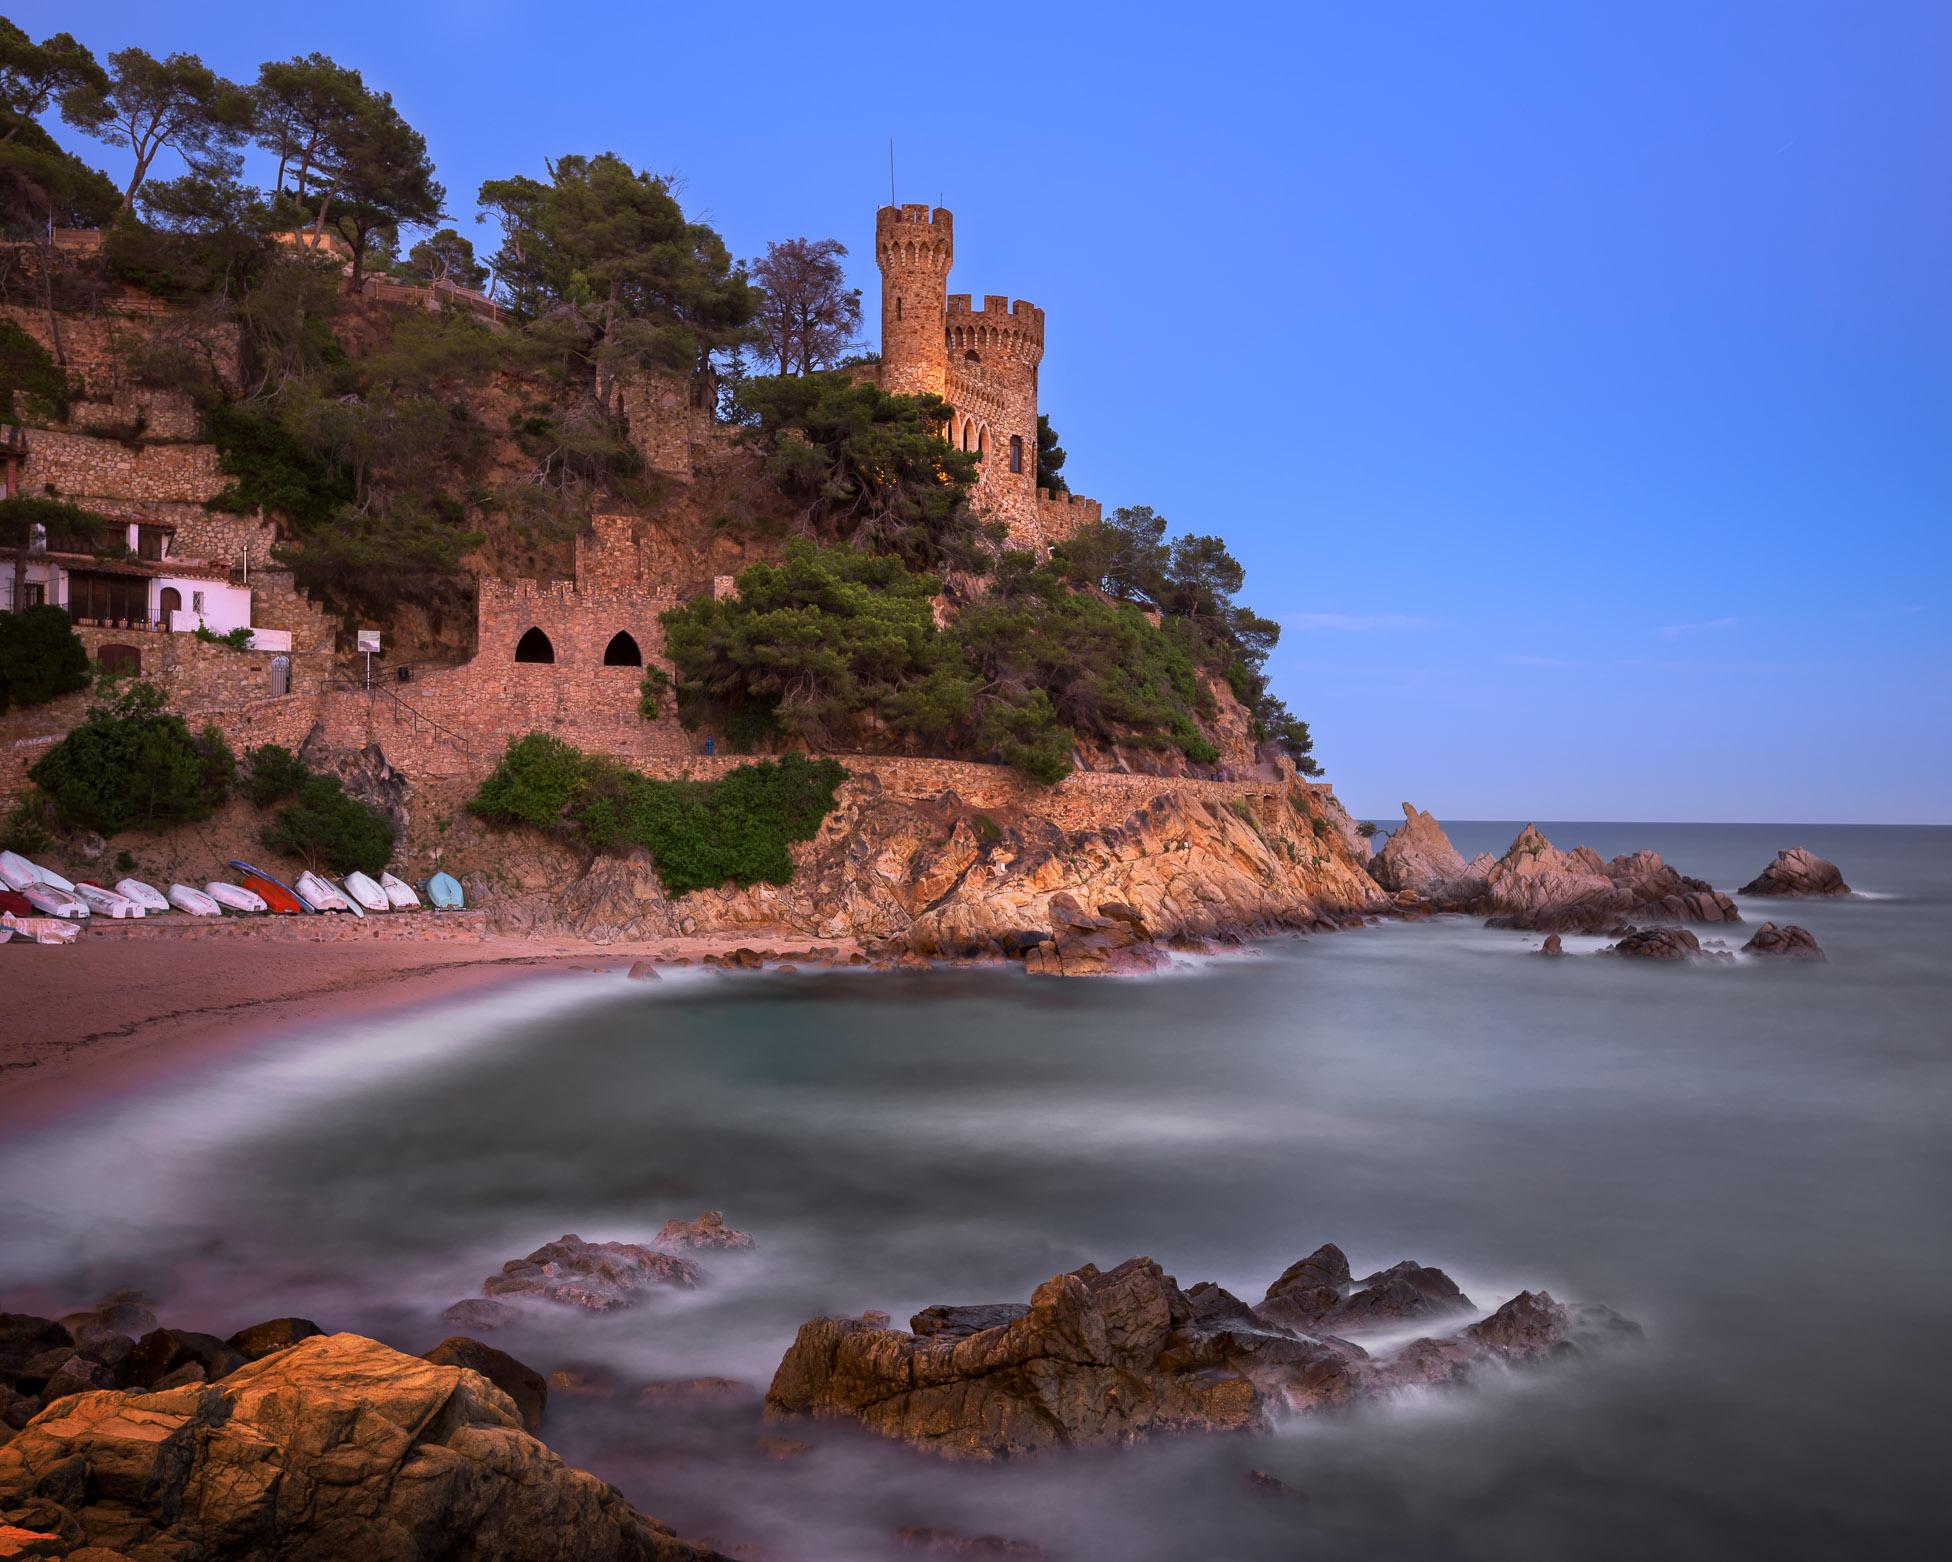 Castle on Lloret De Mar Beach in the Evening, Catalonia, Spain